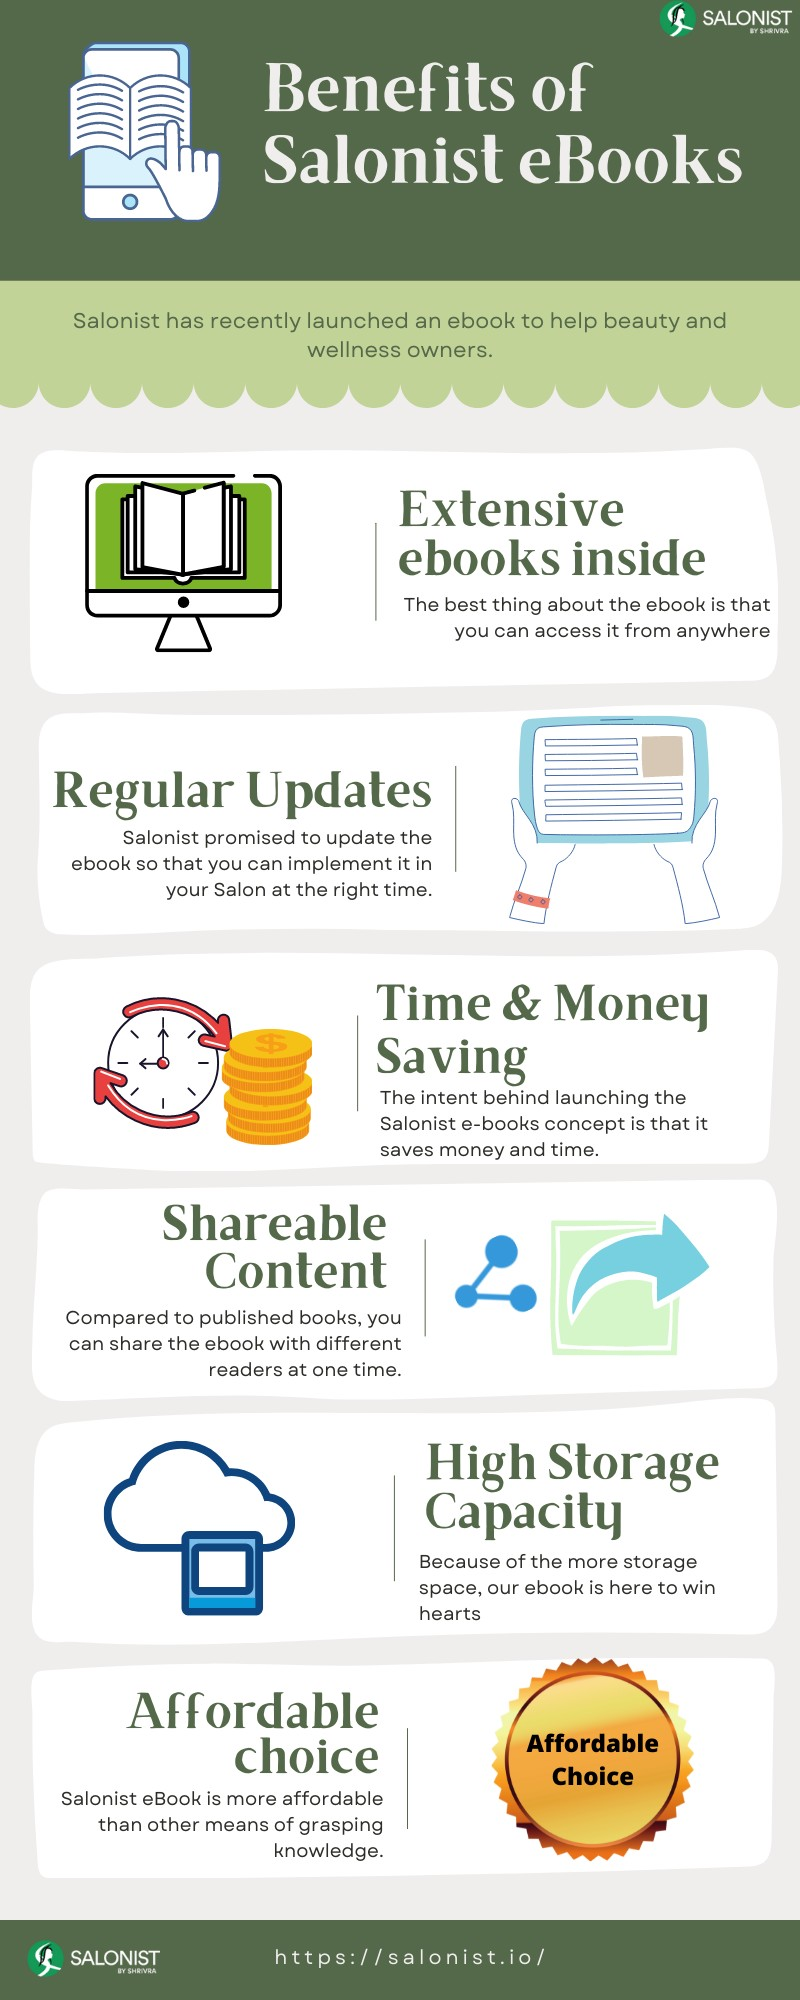 Benefits of Salonist E-books